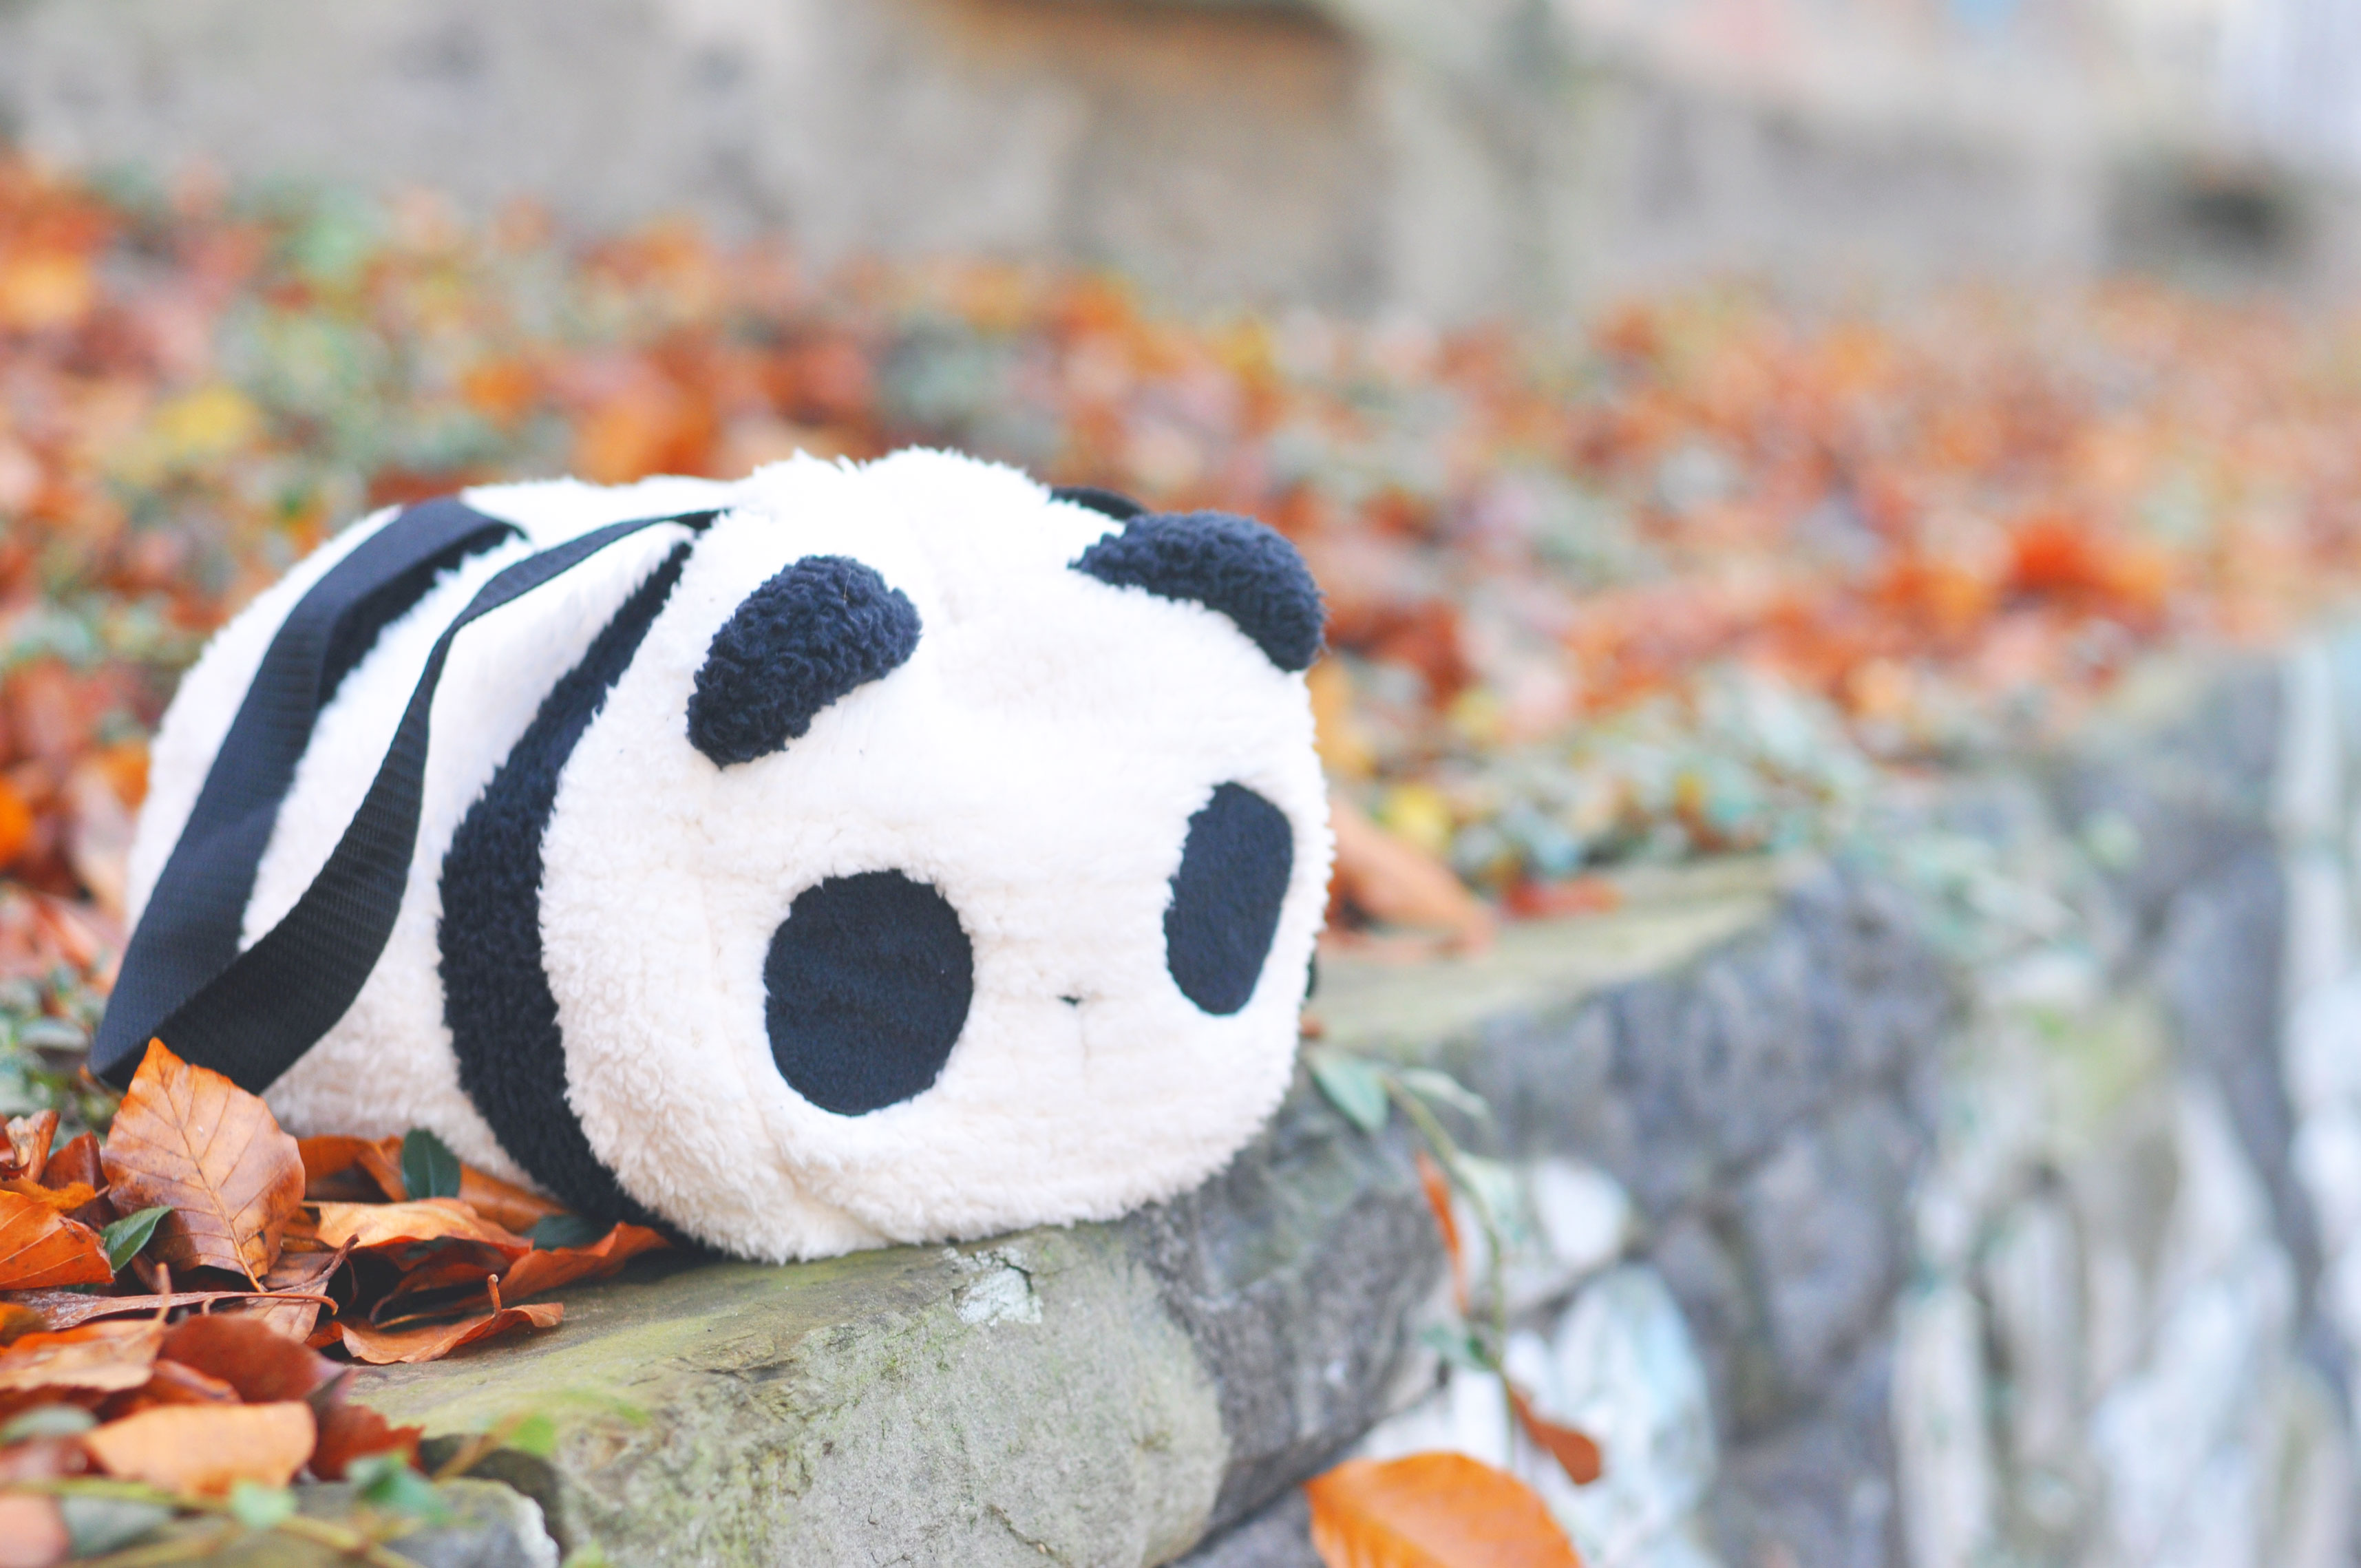 Pandatasche